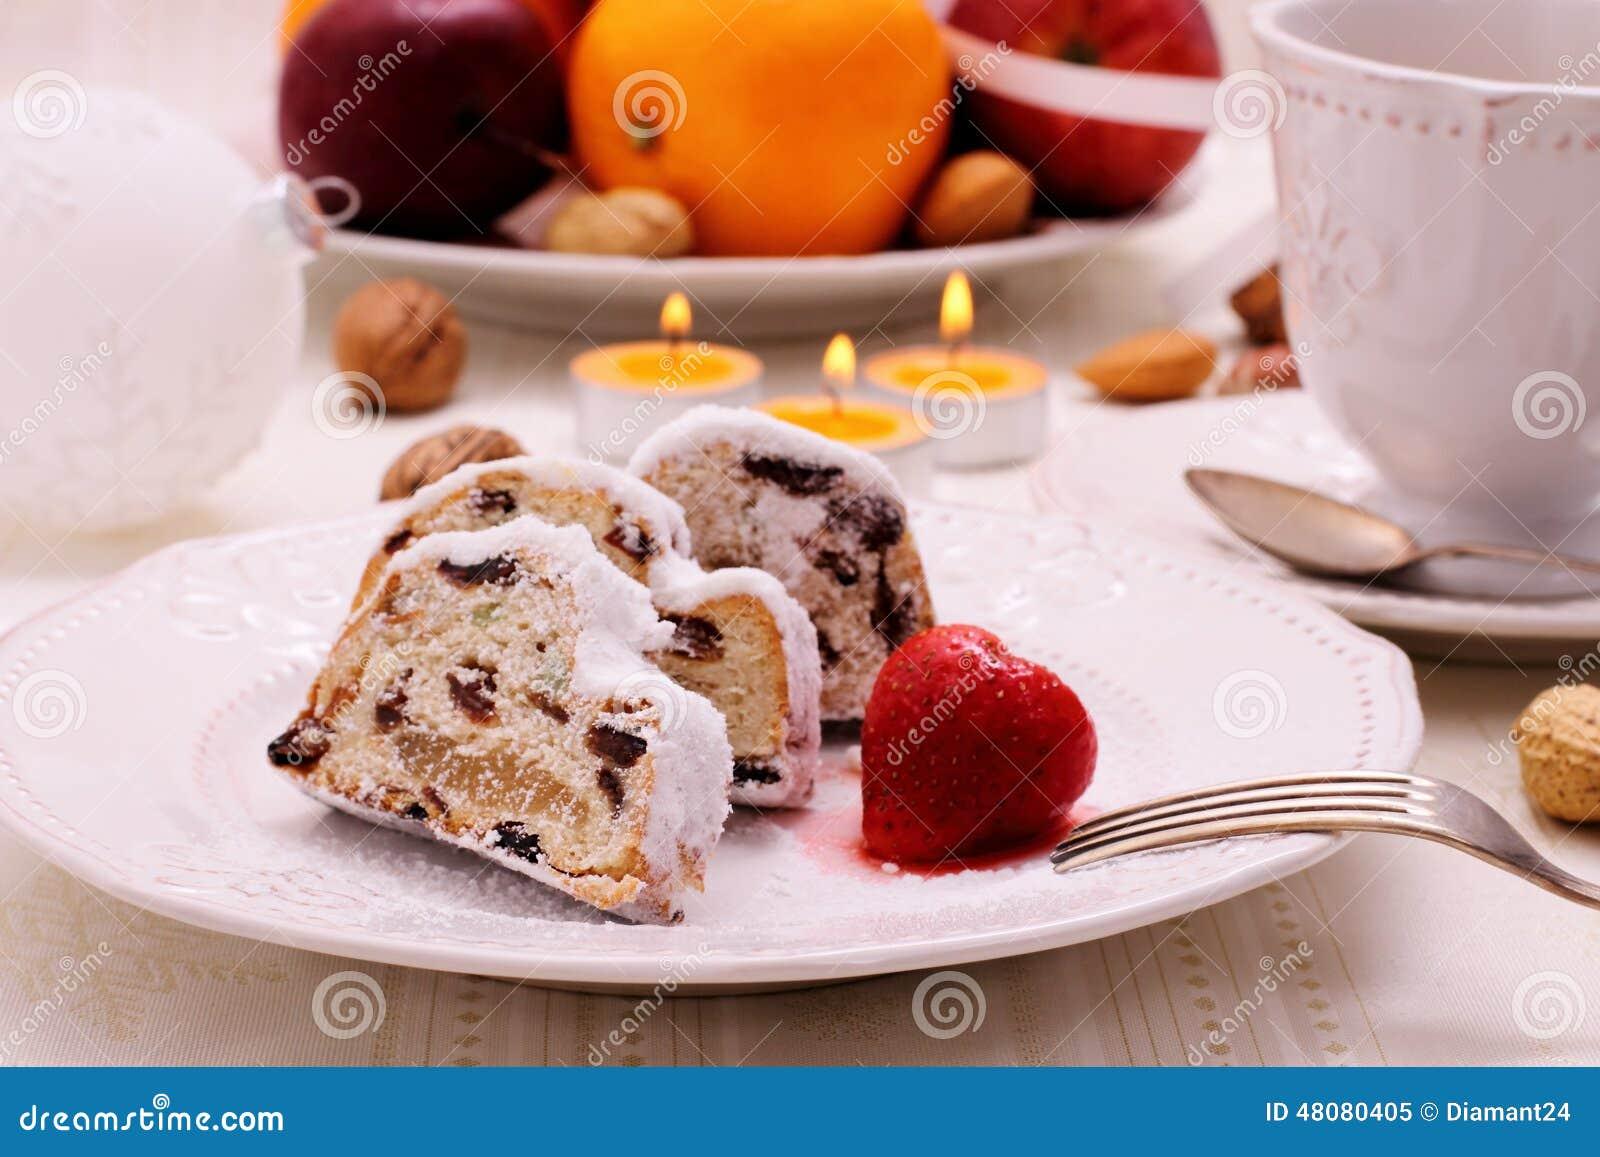 Gateau au fruit hiver